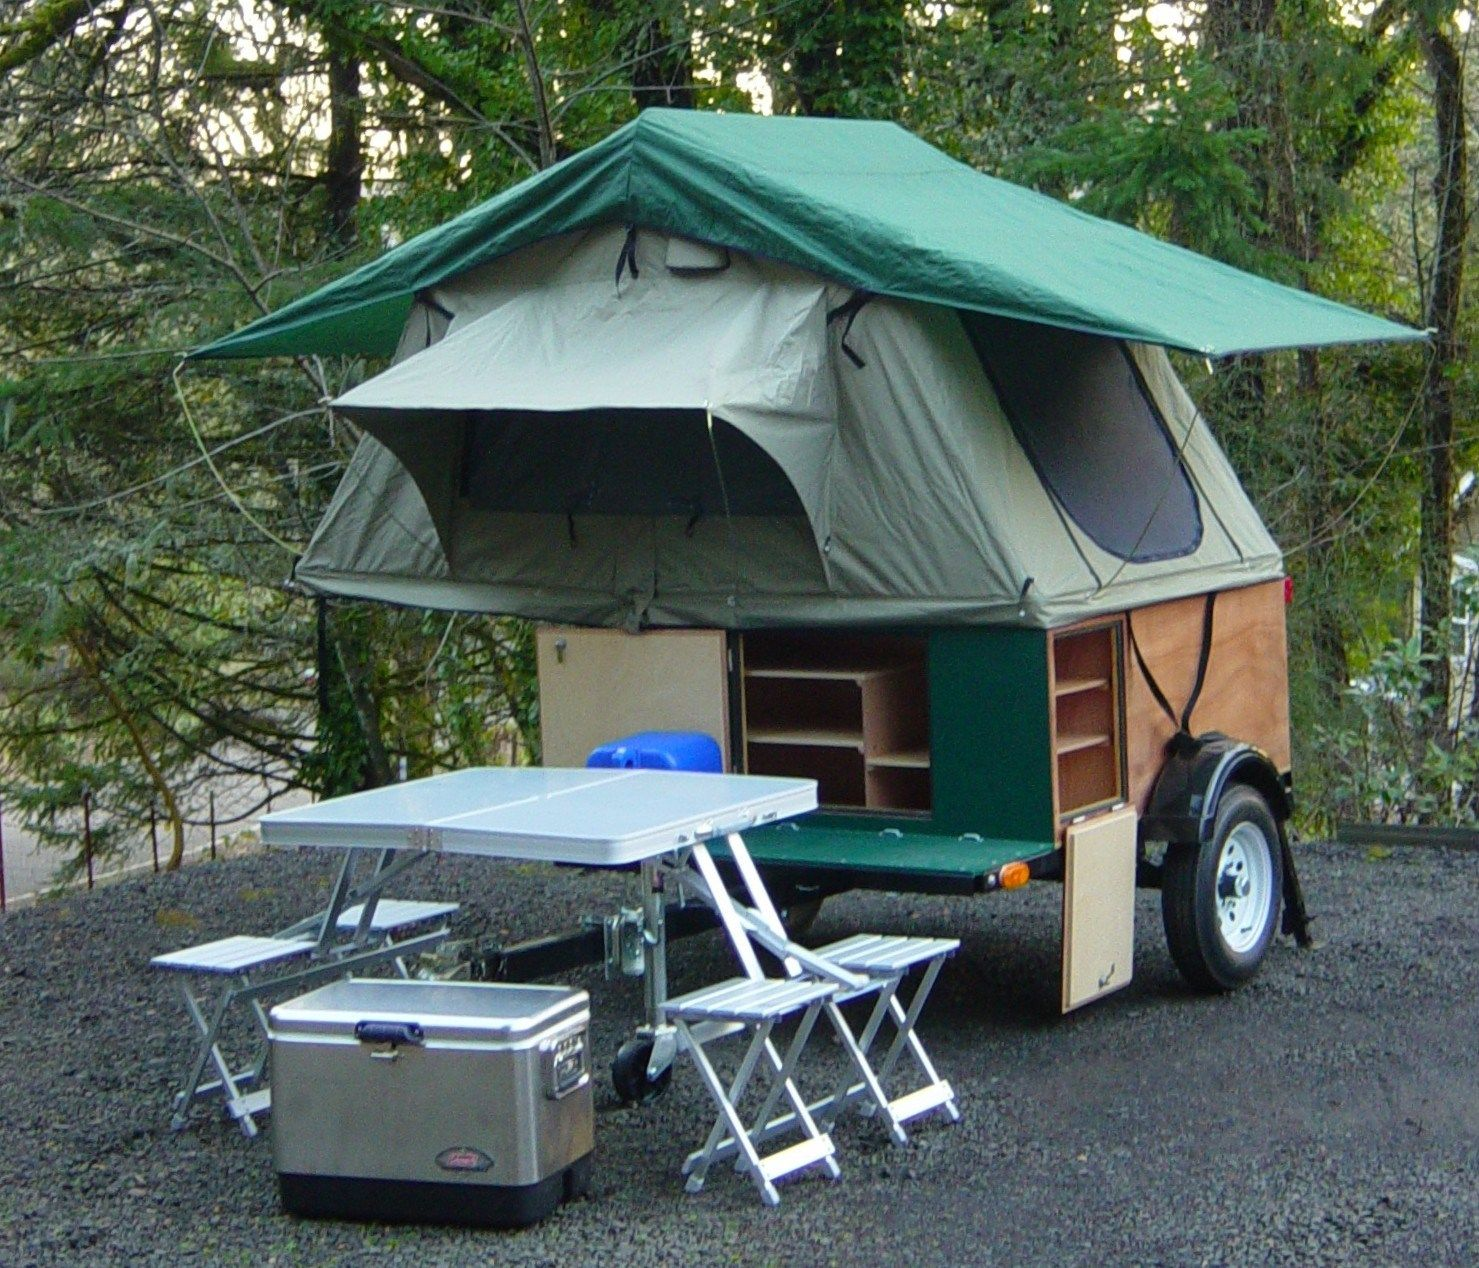 Compact Camping Concepts Diy tent, Diy camping, Diy